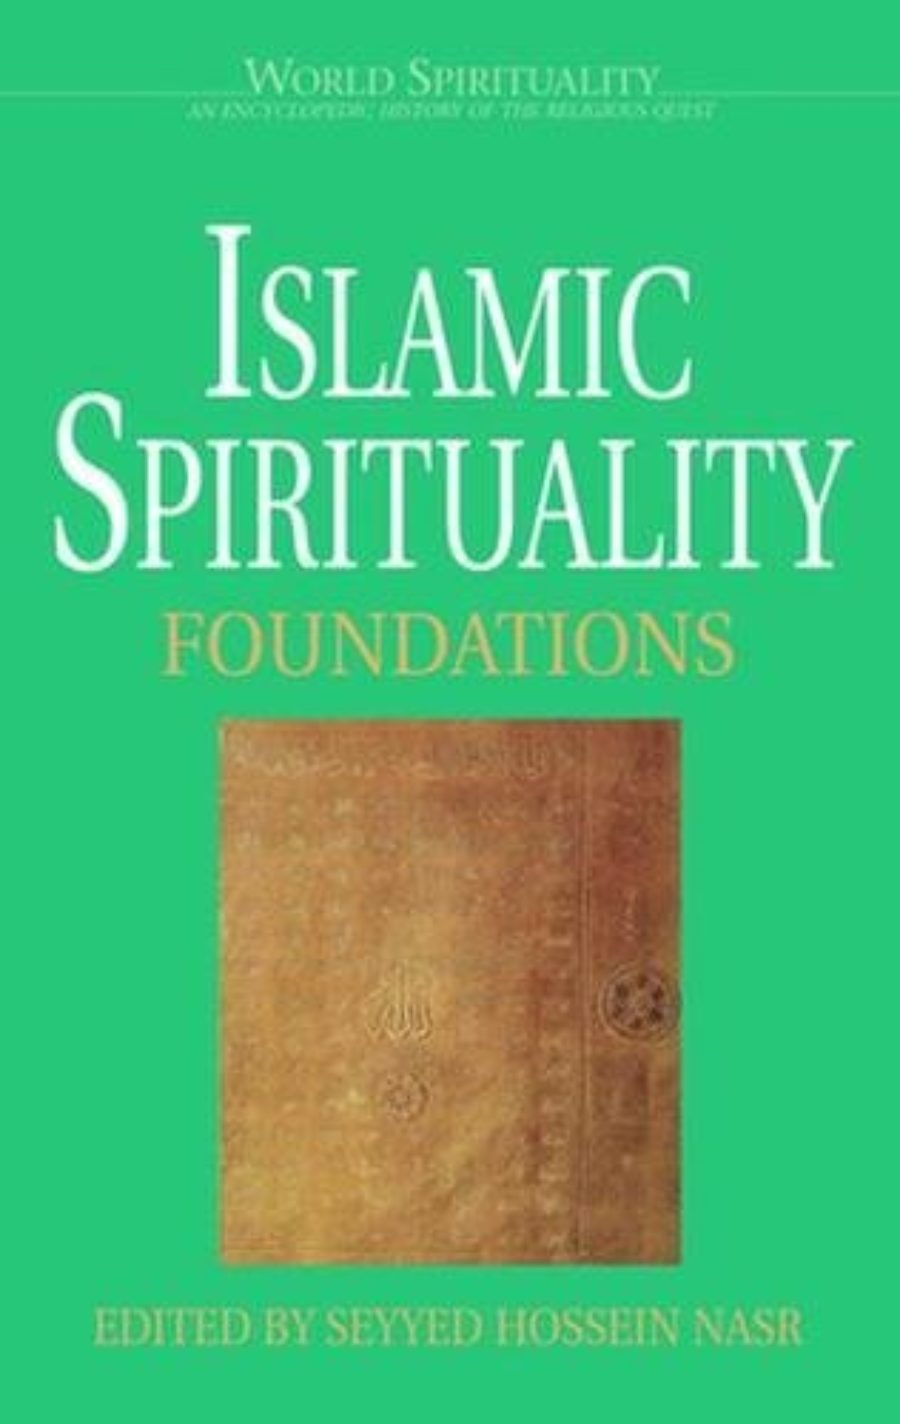 Cover of Islamic Spirituality: Foundations (World Spirituality)